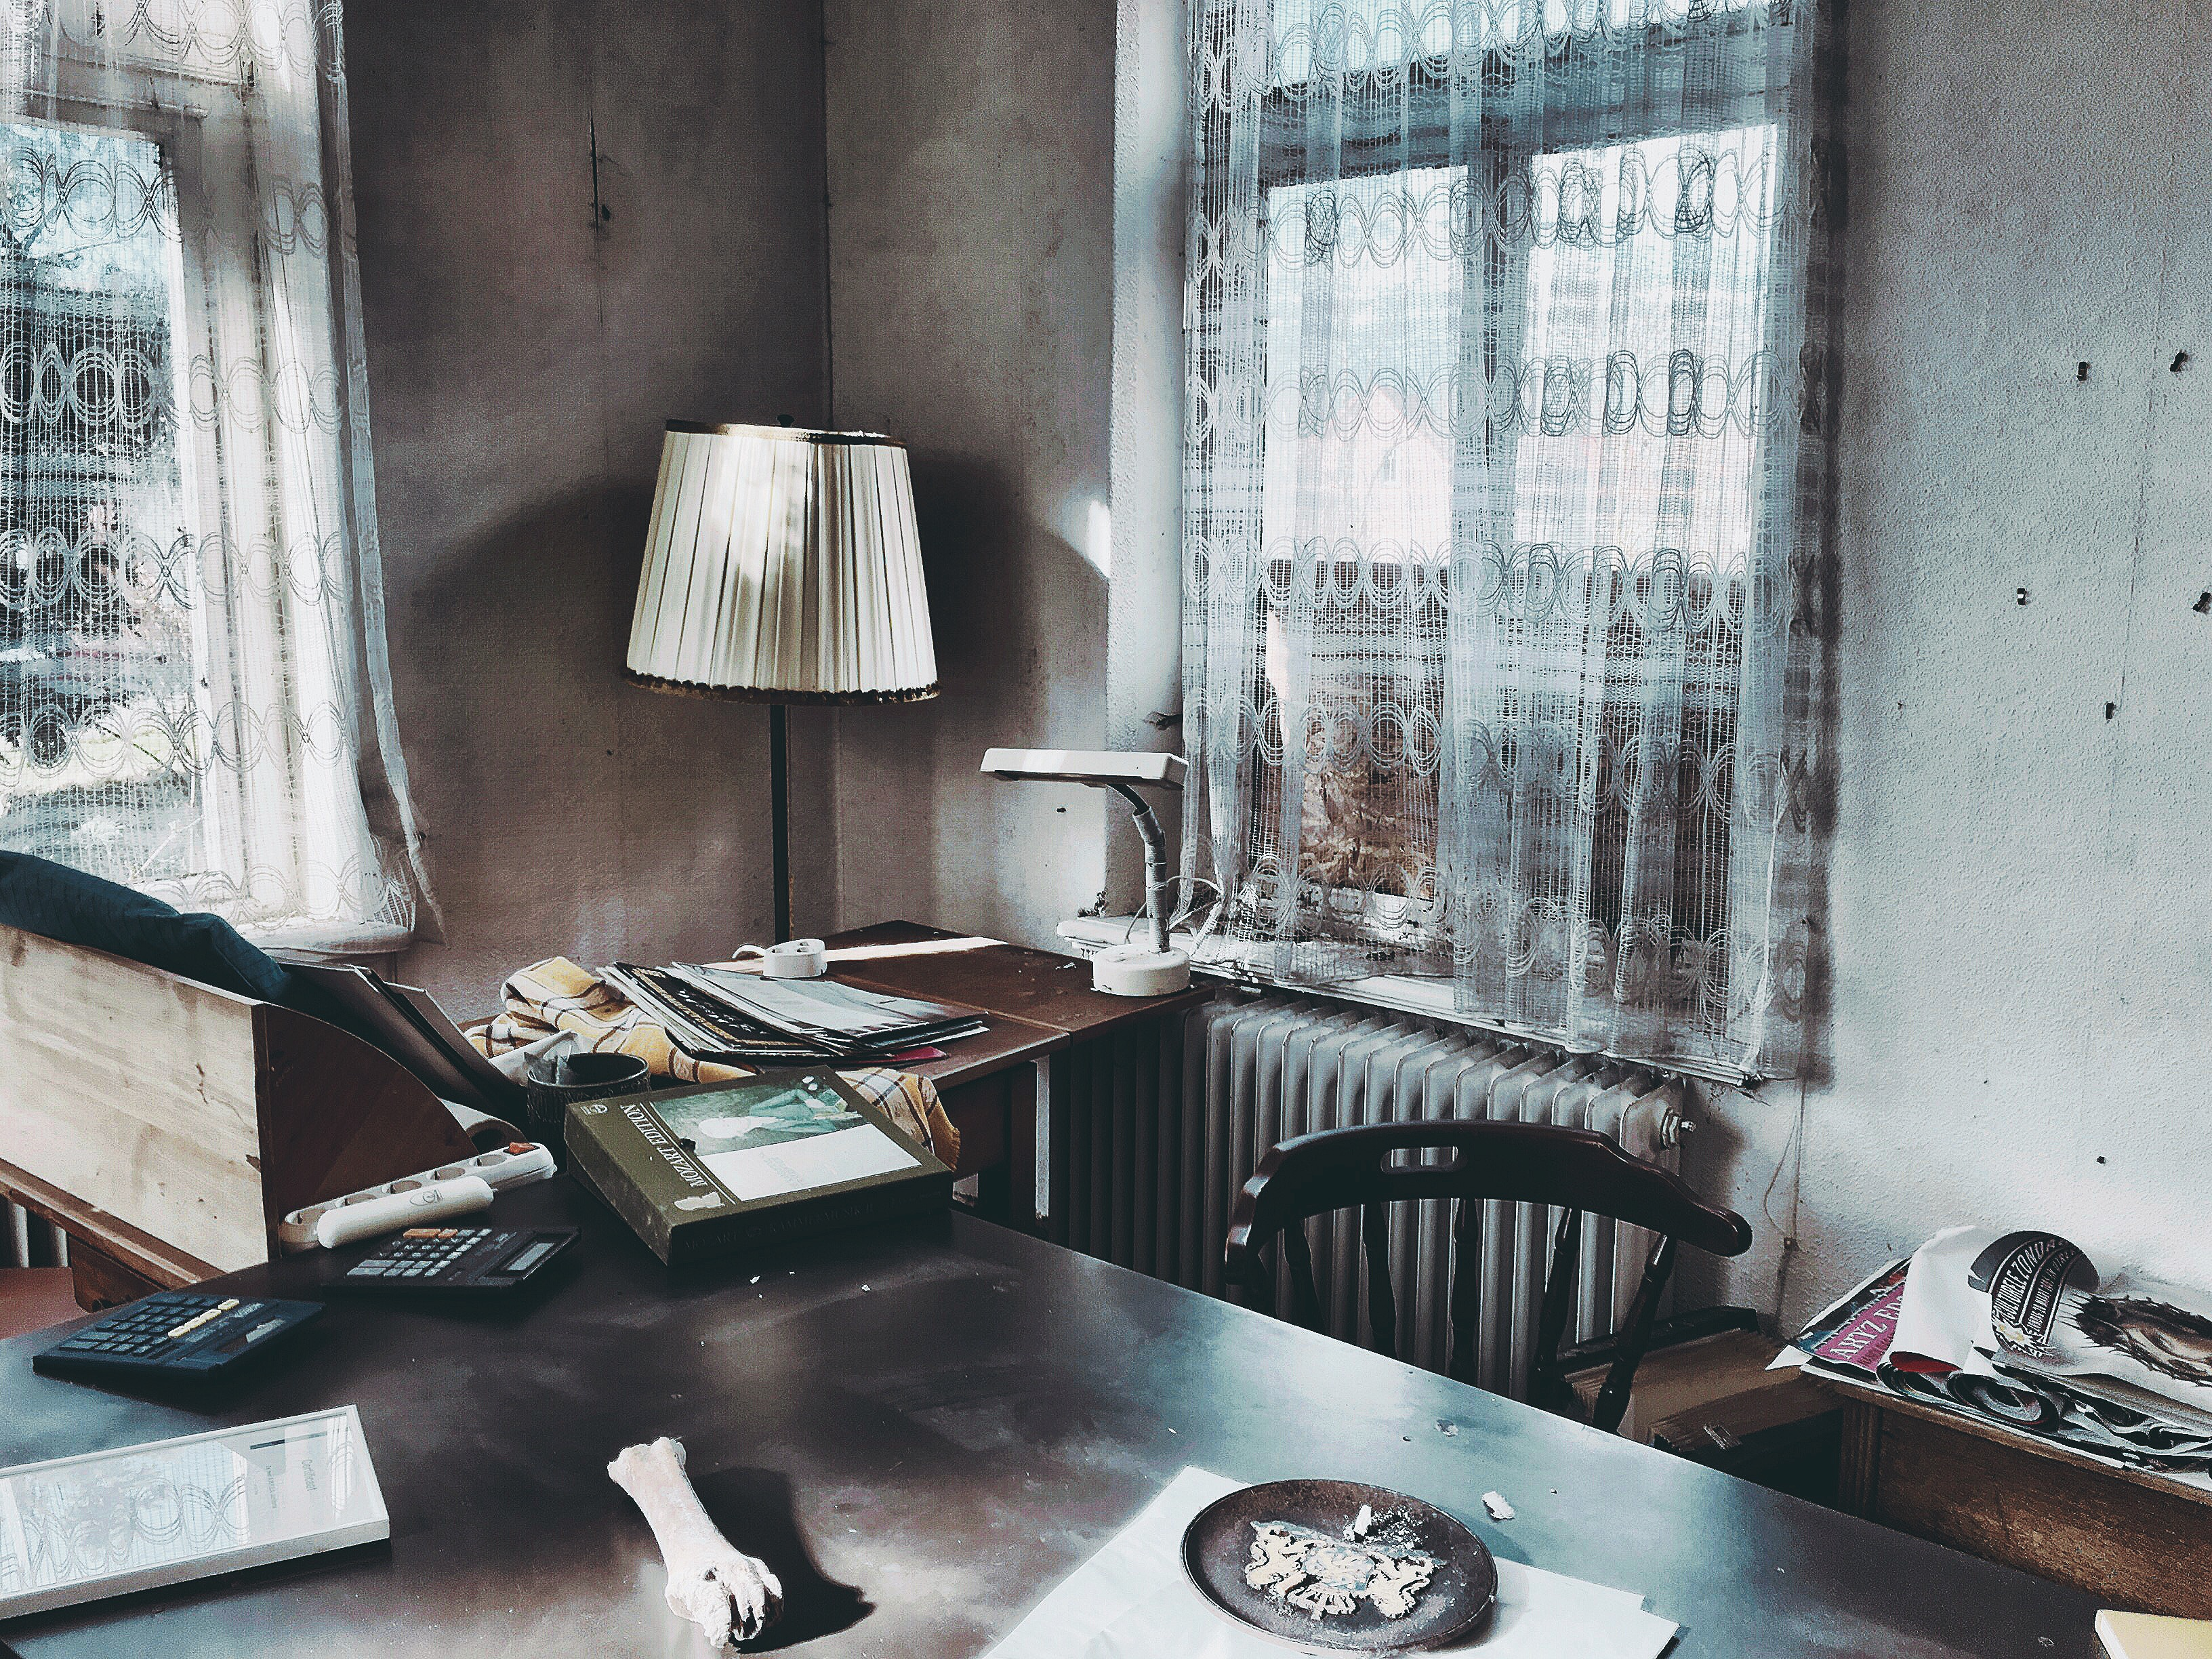 Hans Borghorst ~ Office at deserted house